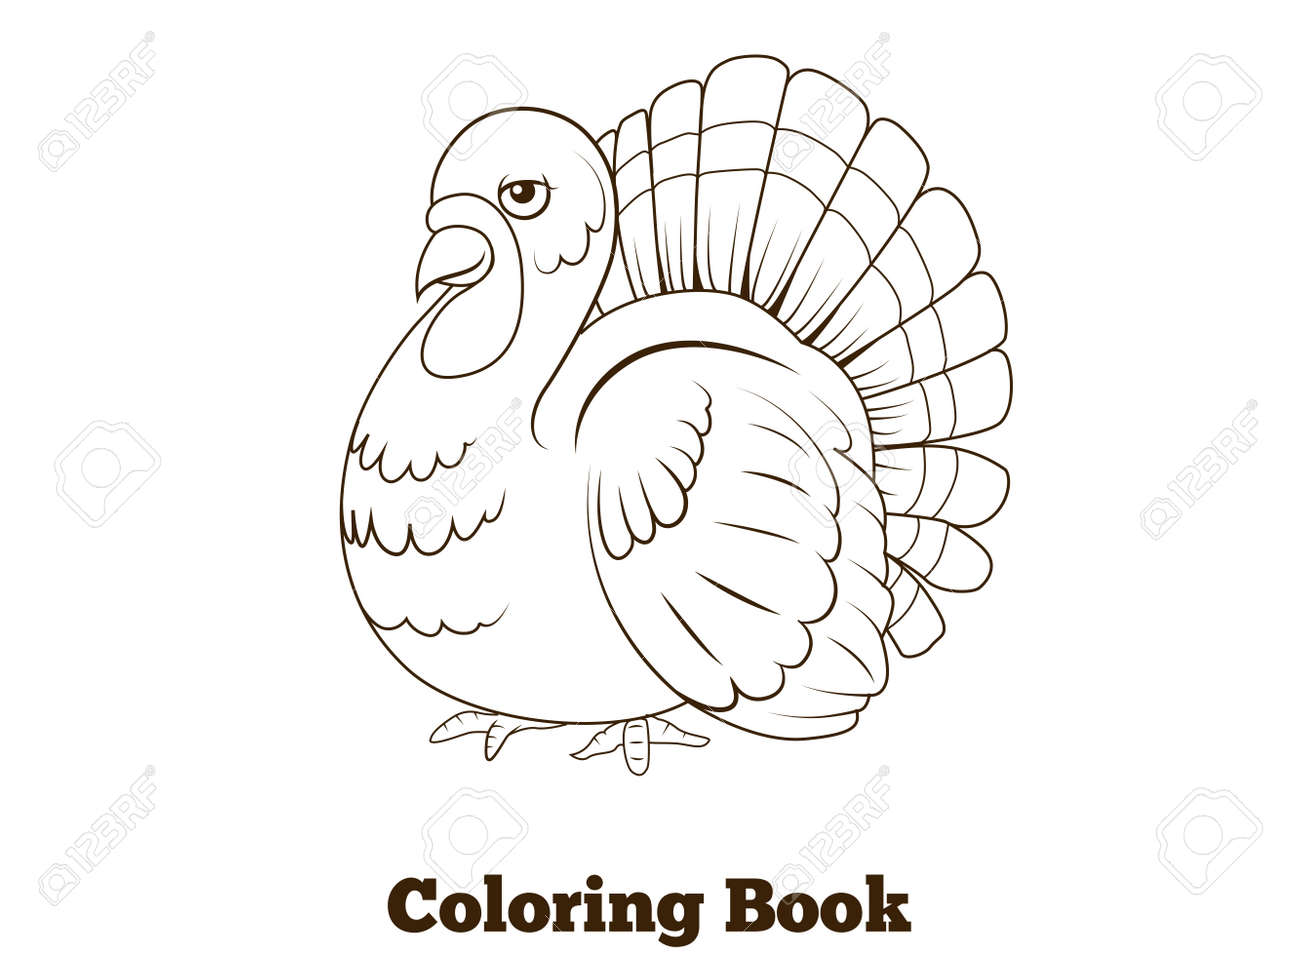 Coloring Book Turkey Cartoon Educational Vector Illustration Royalty ...